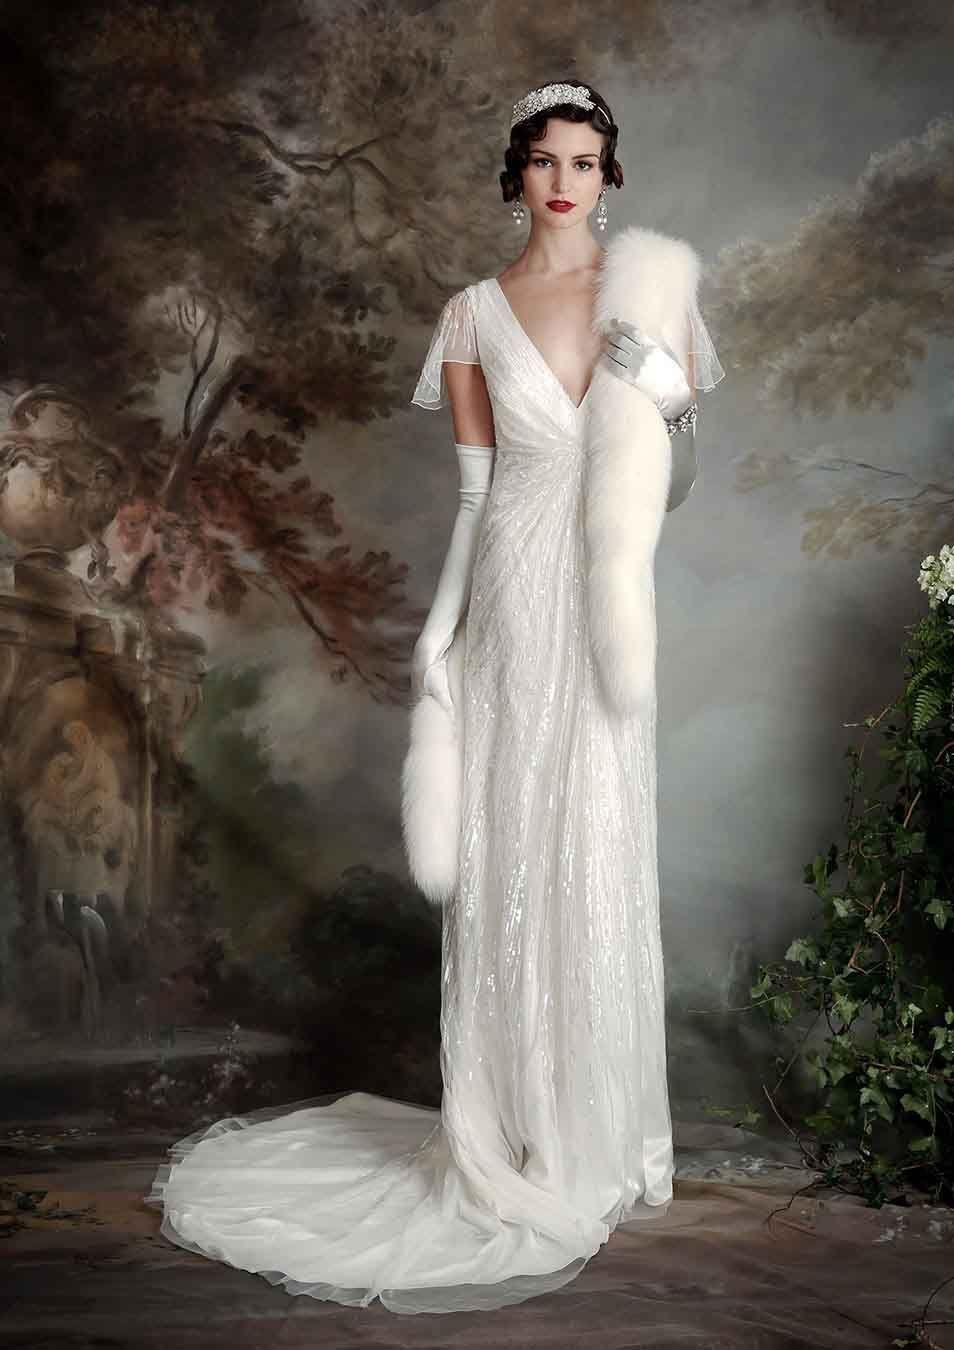 s inspired wedding dresses Eliza Jane Howell Wedding Dresses Debutante Collection